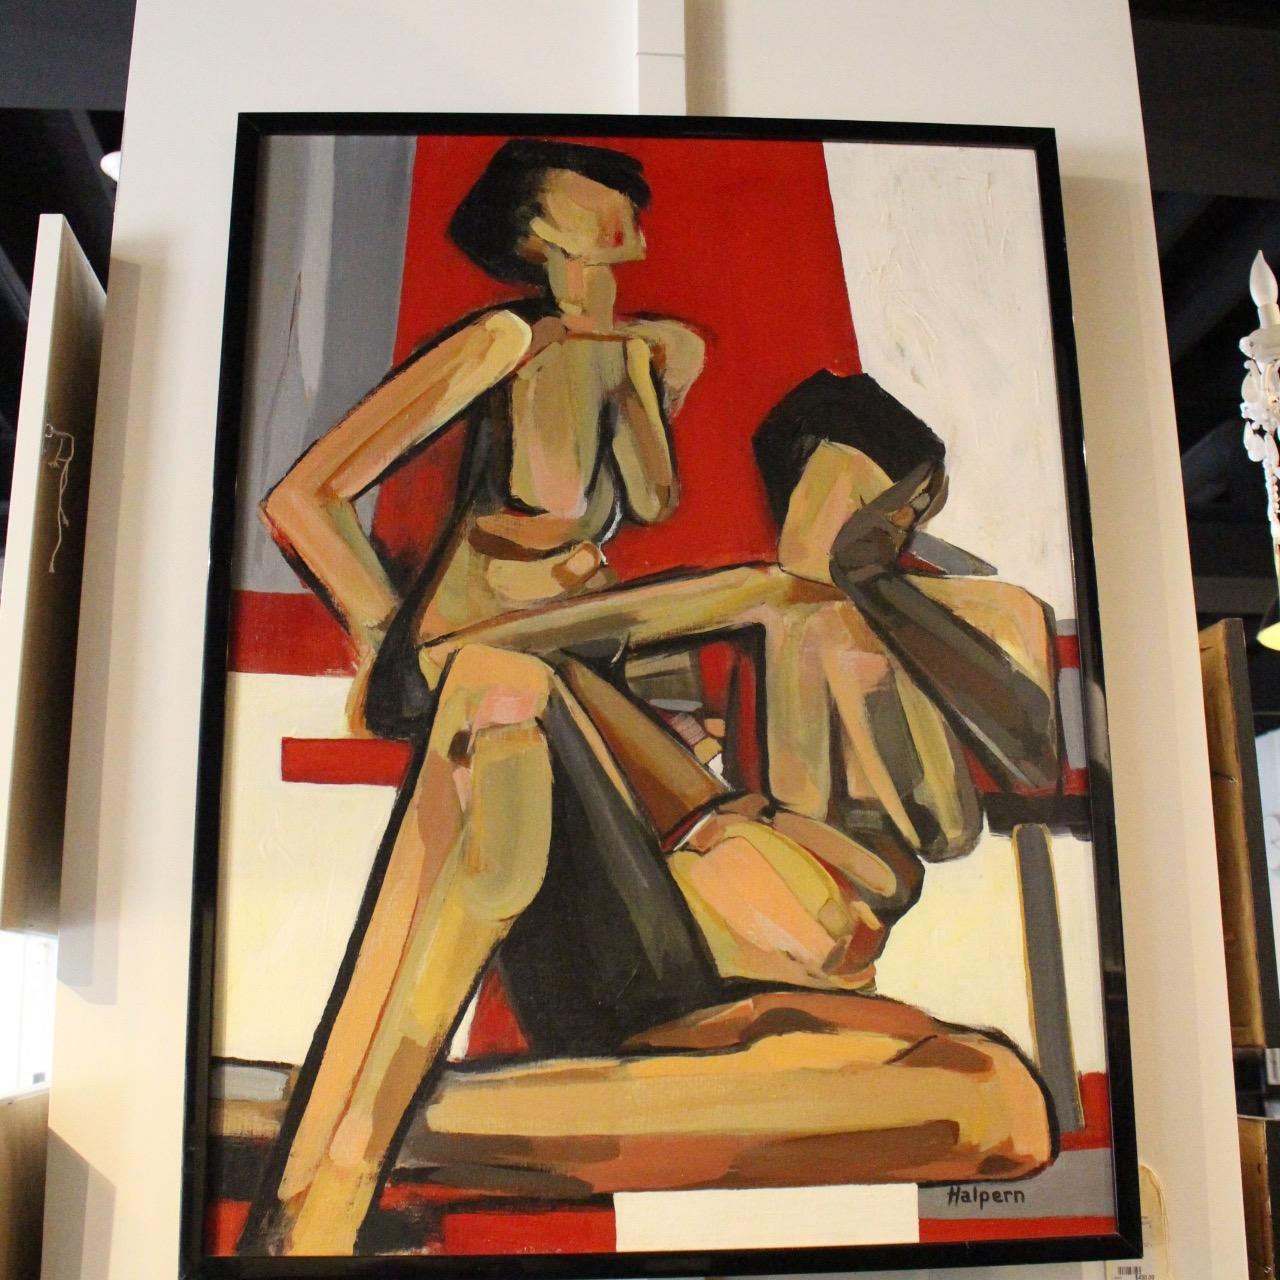 Abstract-Halpern-Painting_63607A.jpg